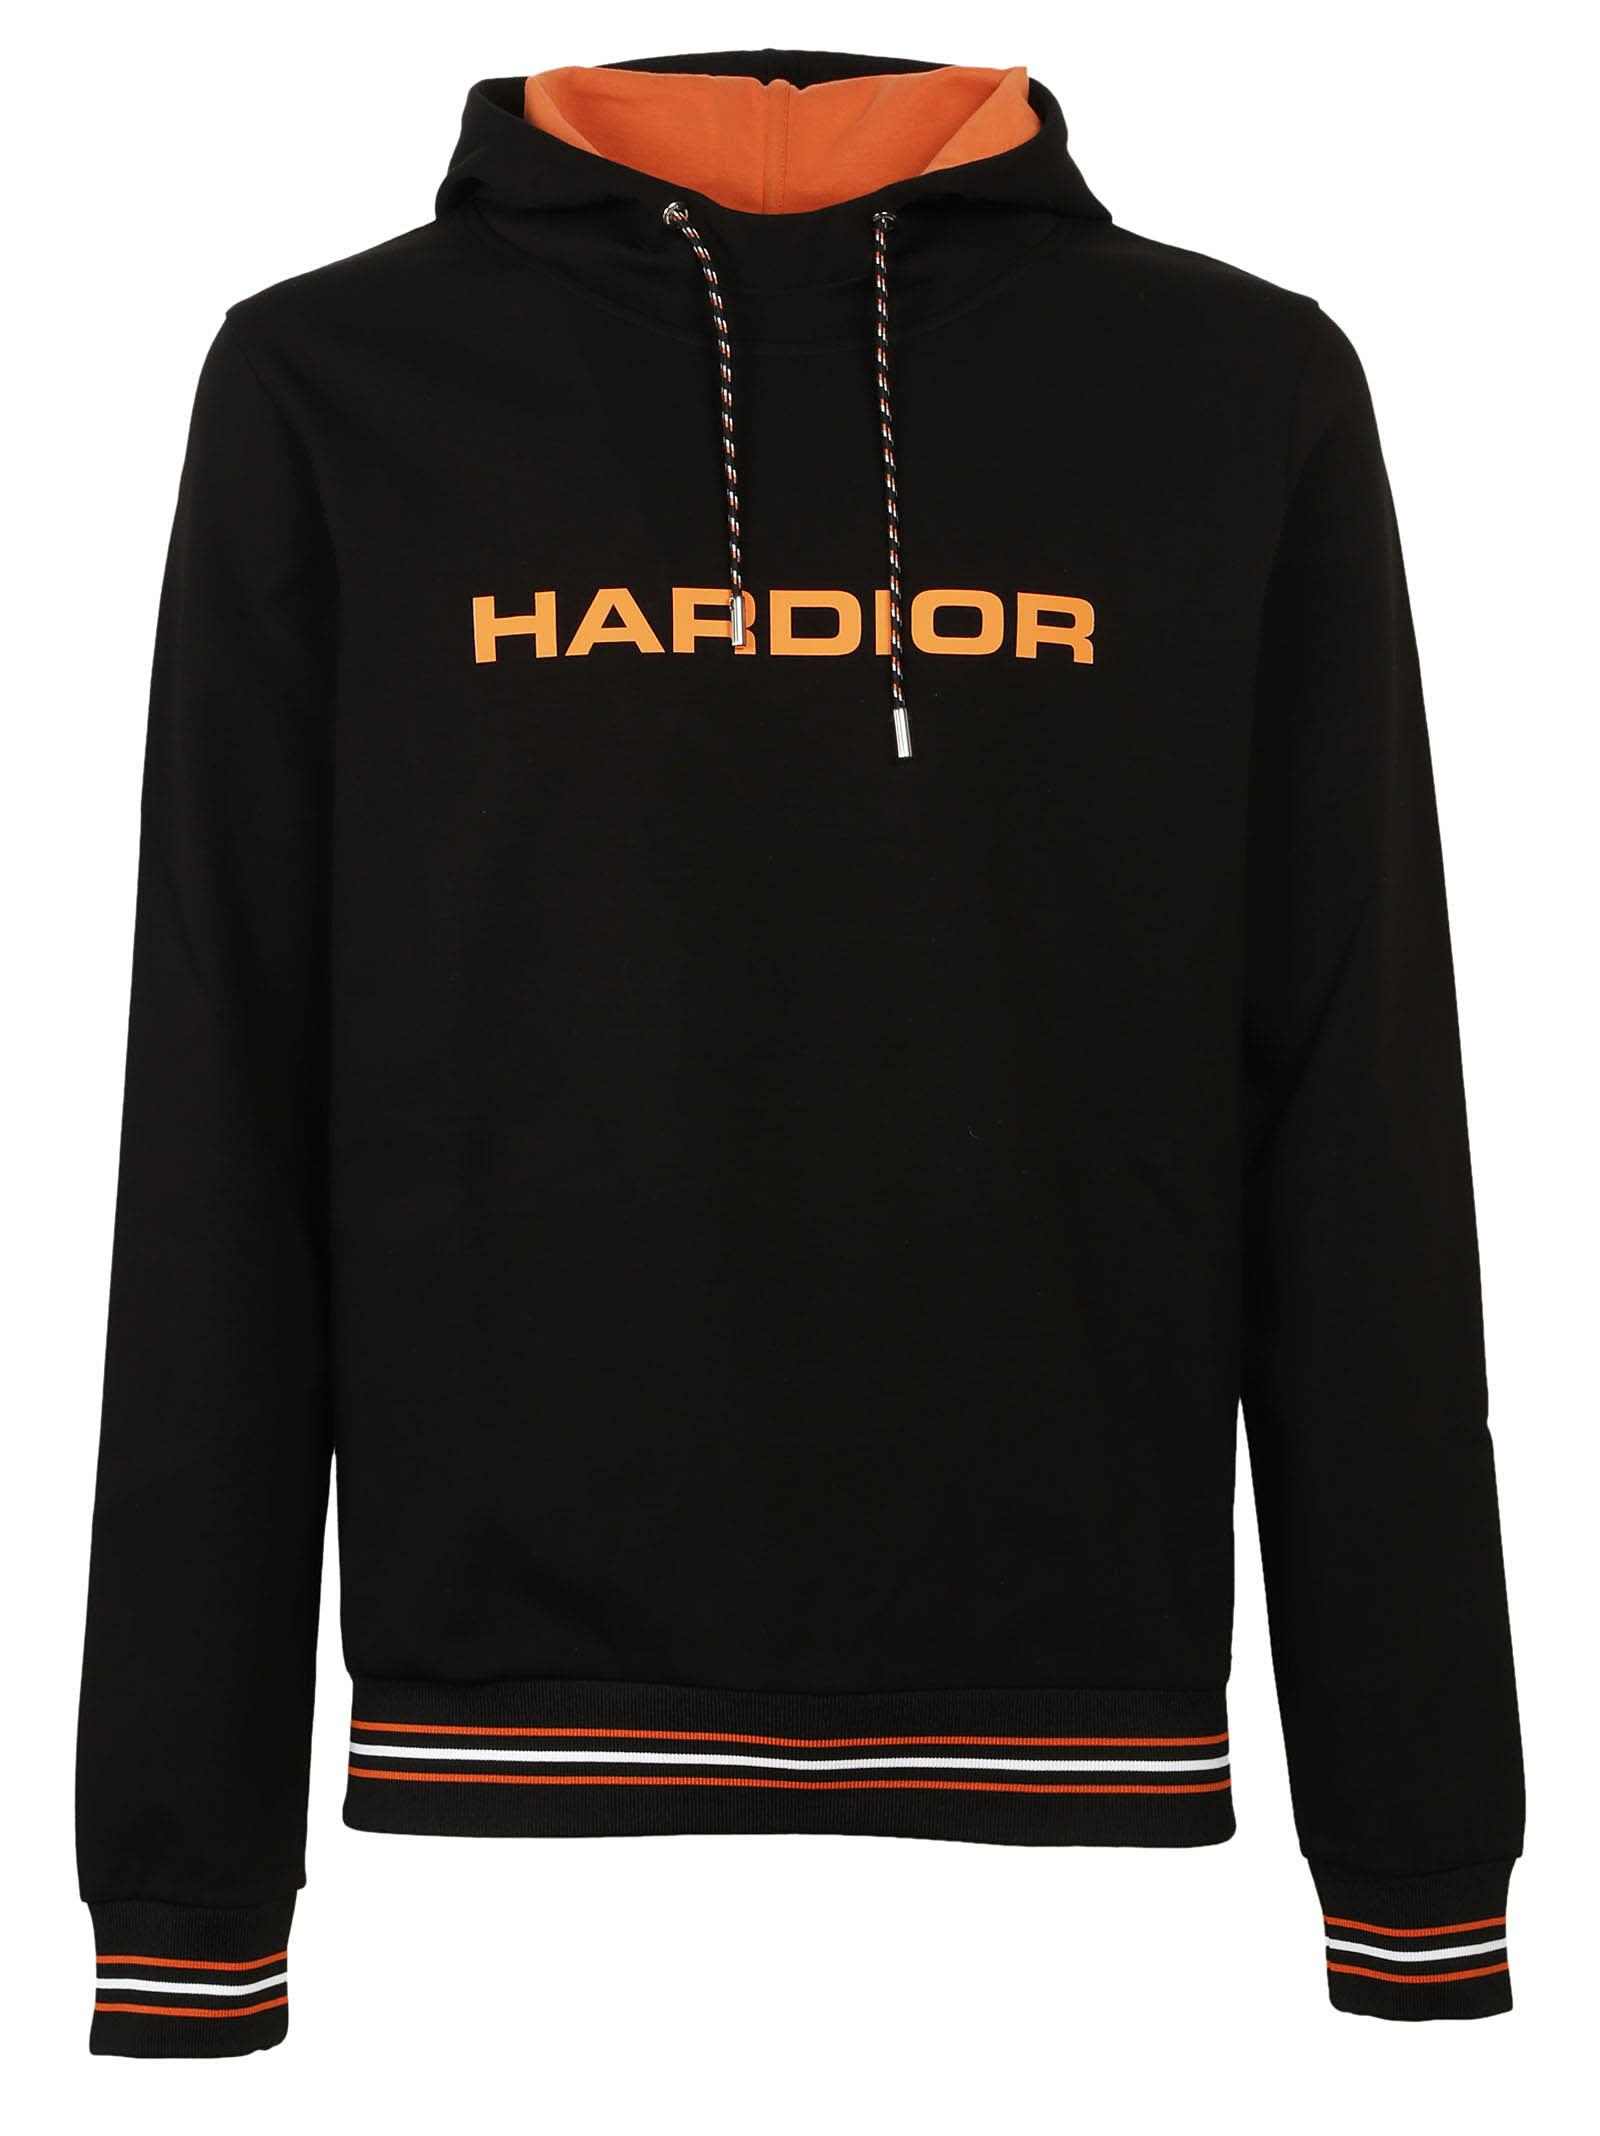 Christian Dior Hardior Hoodie